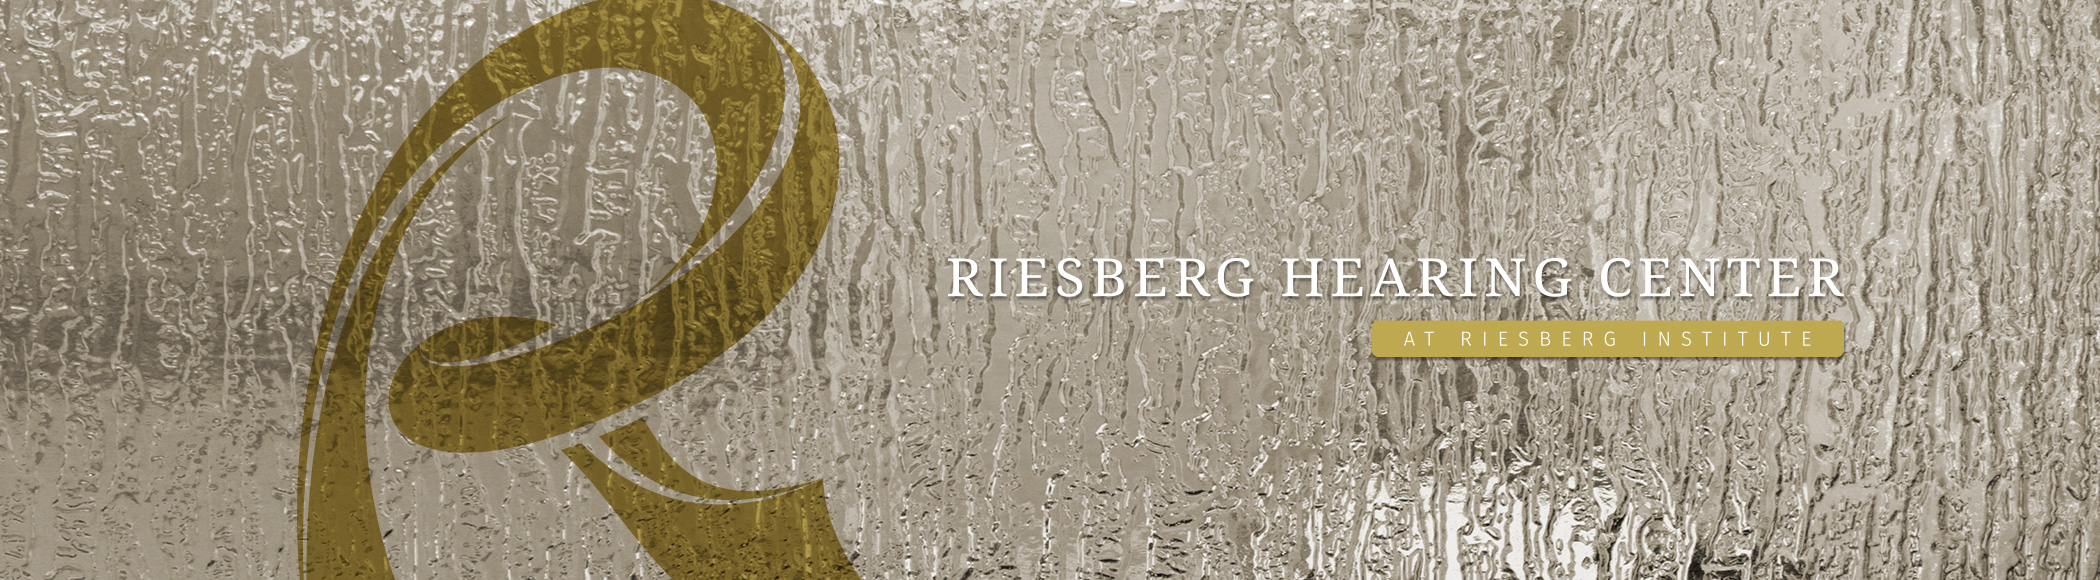 Hearing Care & Hearing Aids at Riesberg Institute